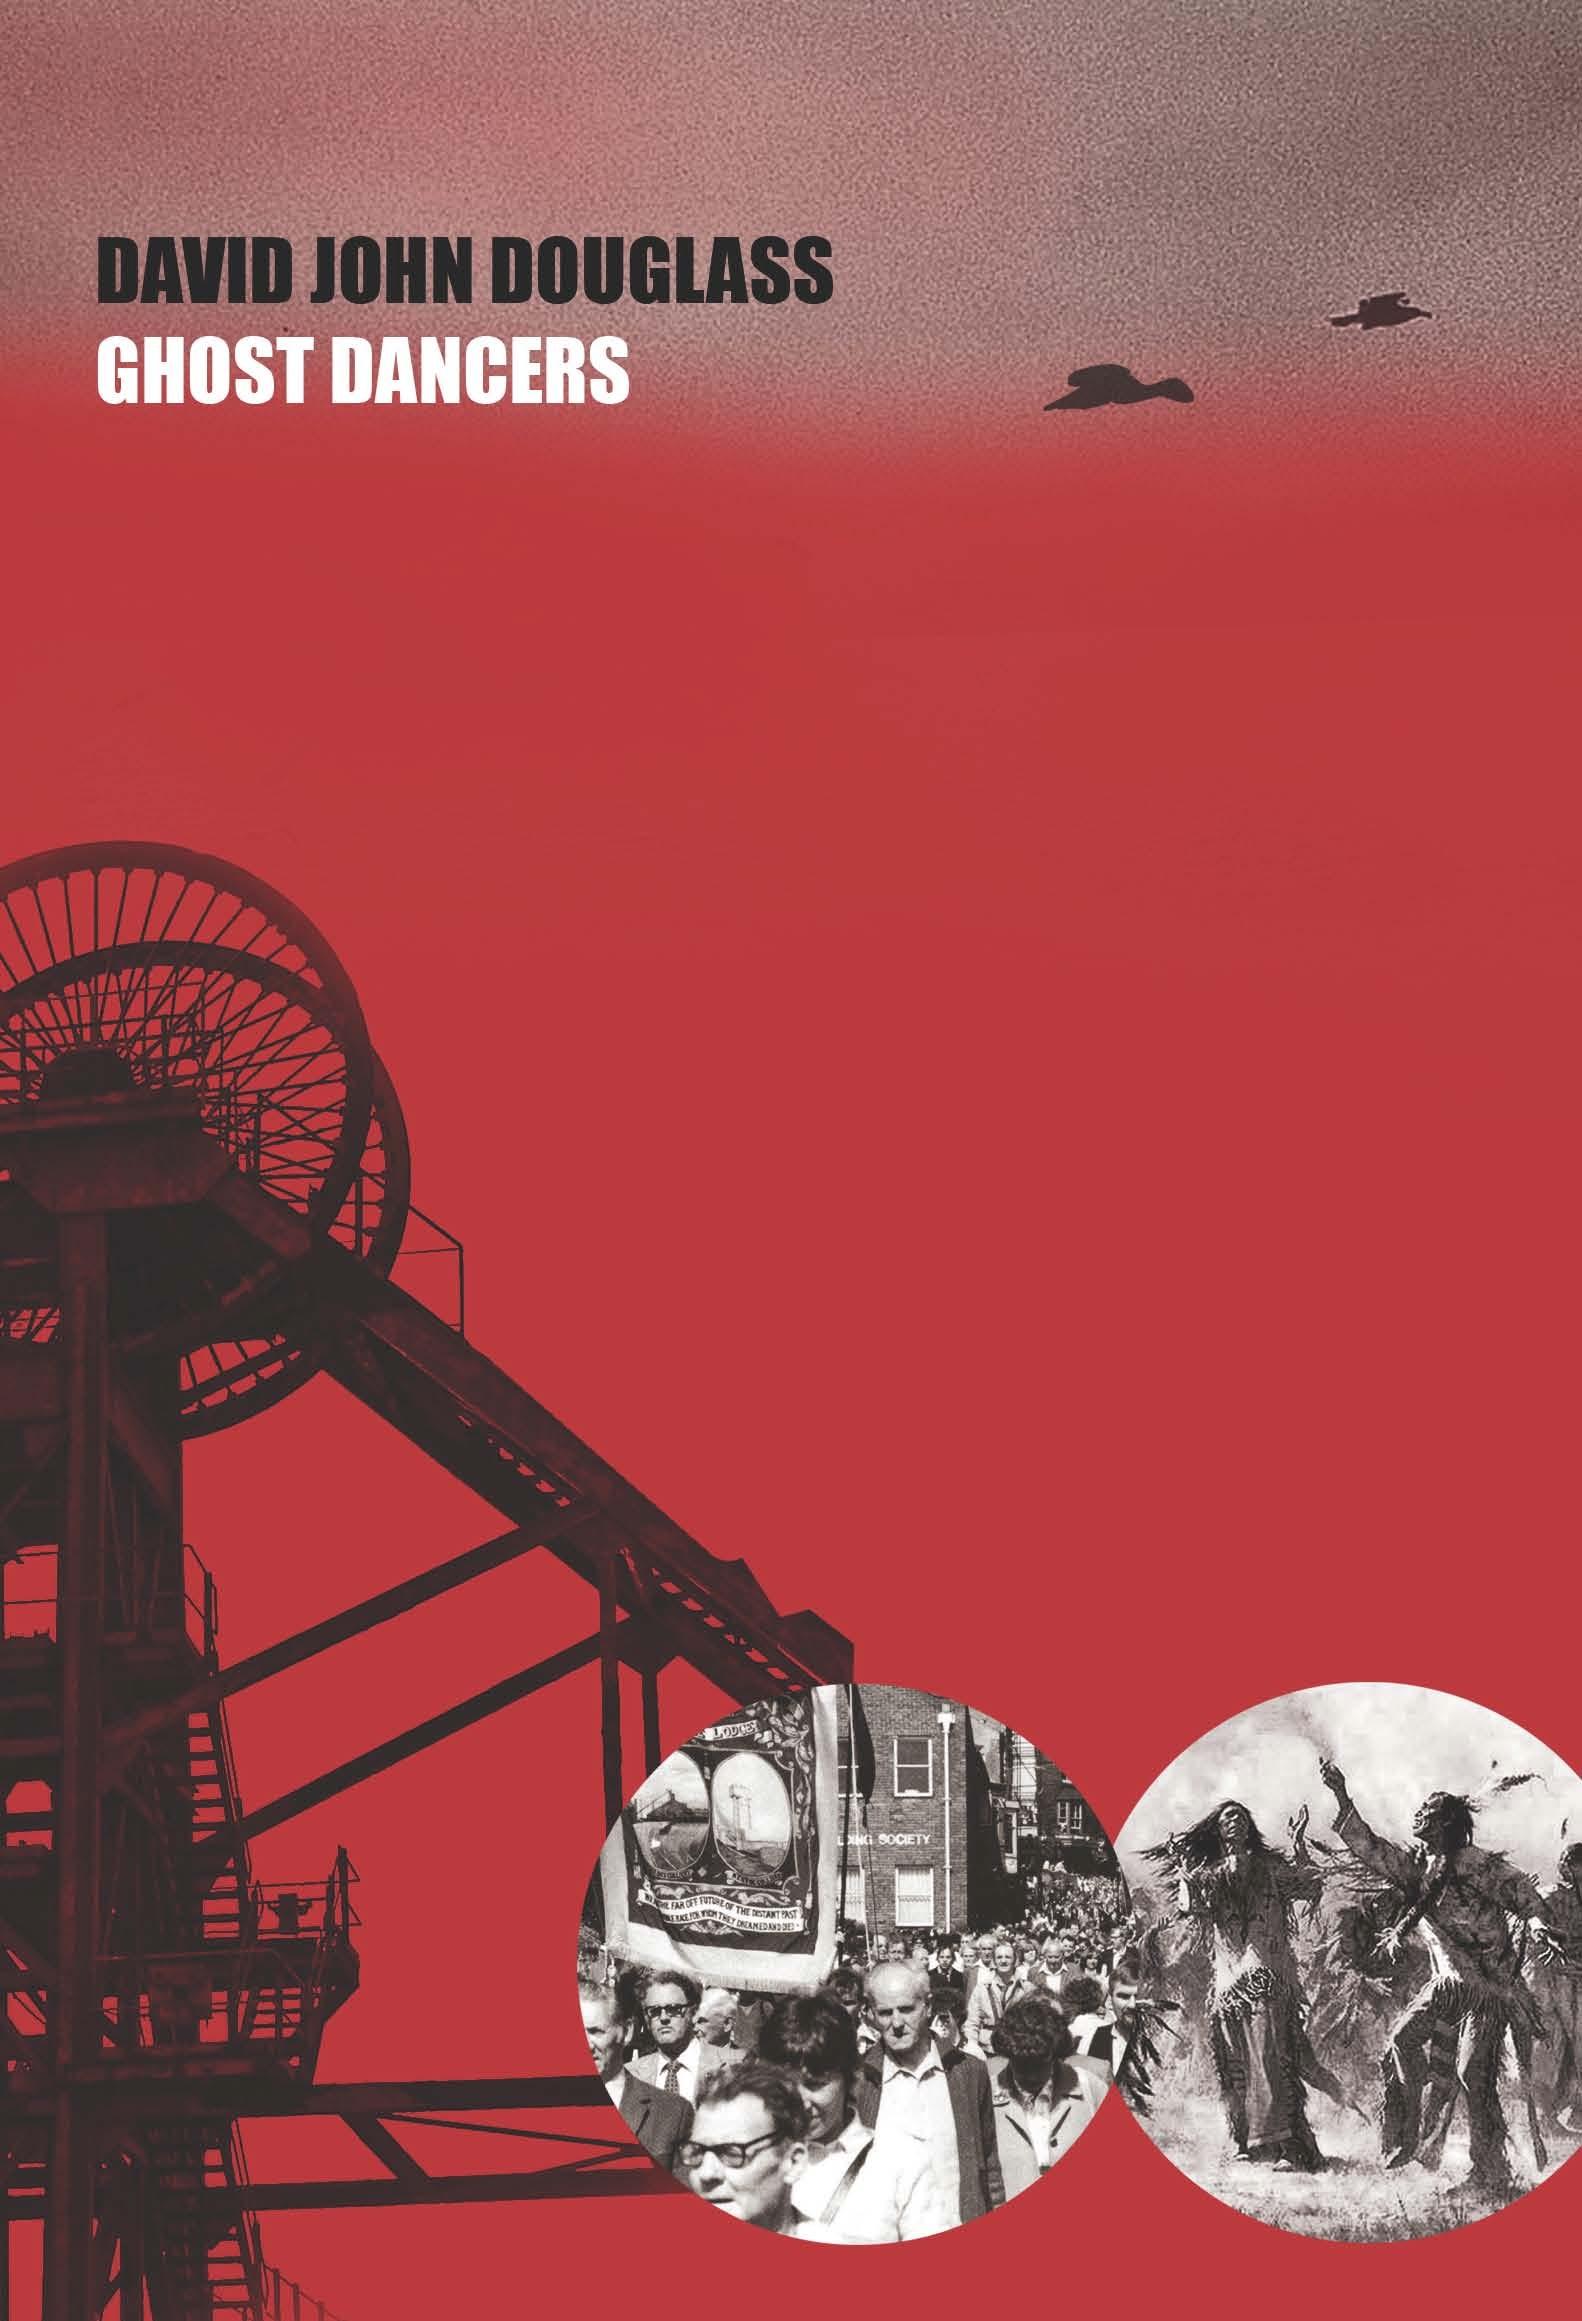 GHOST DANCERS — Dave Douglass